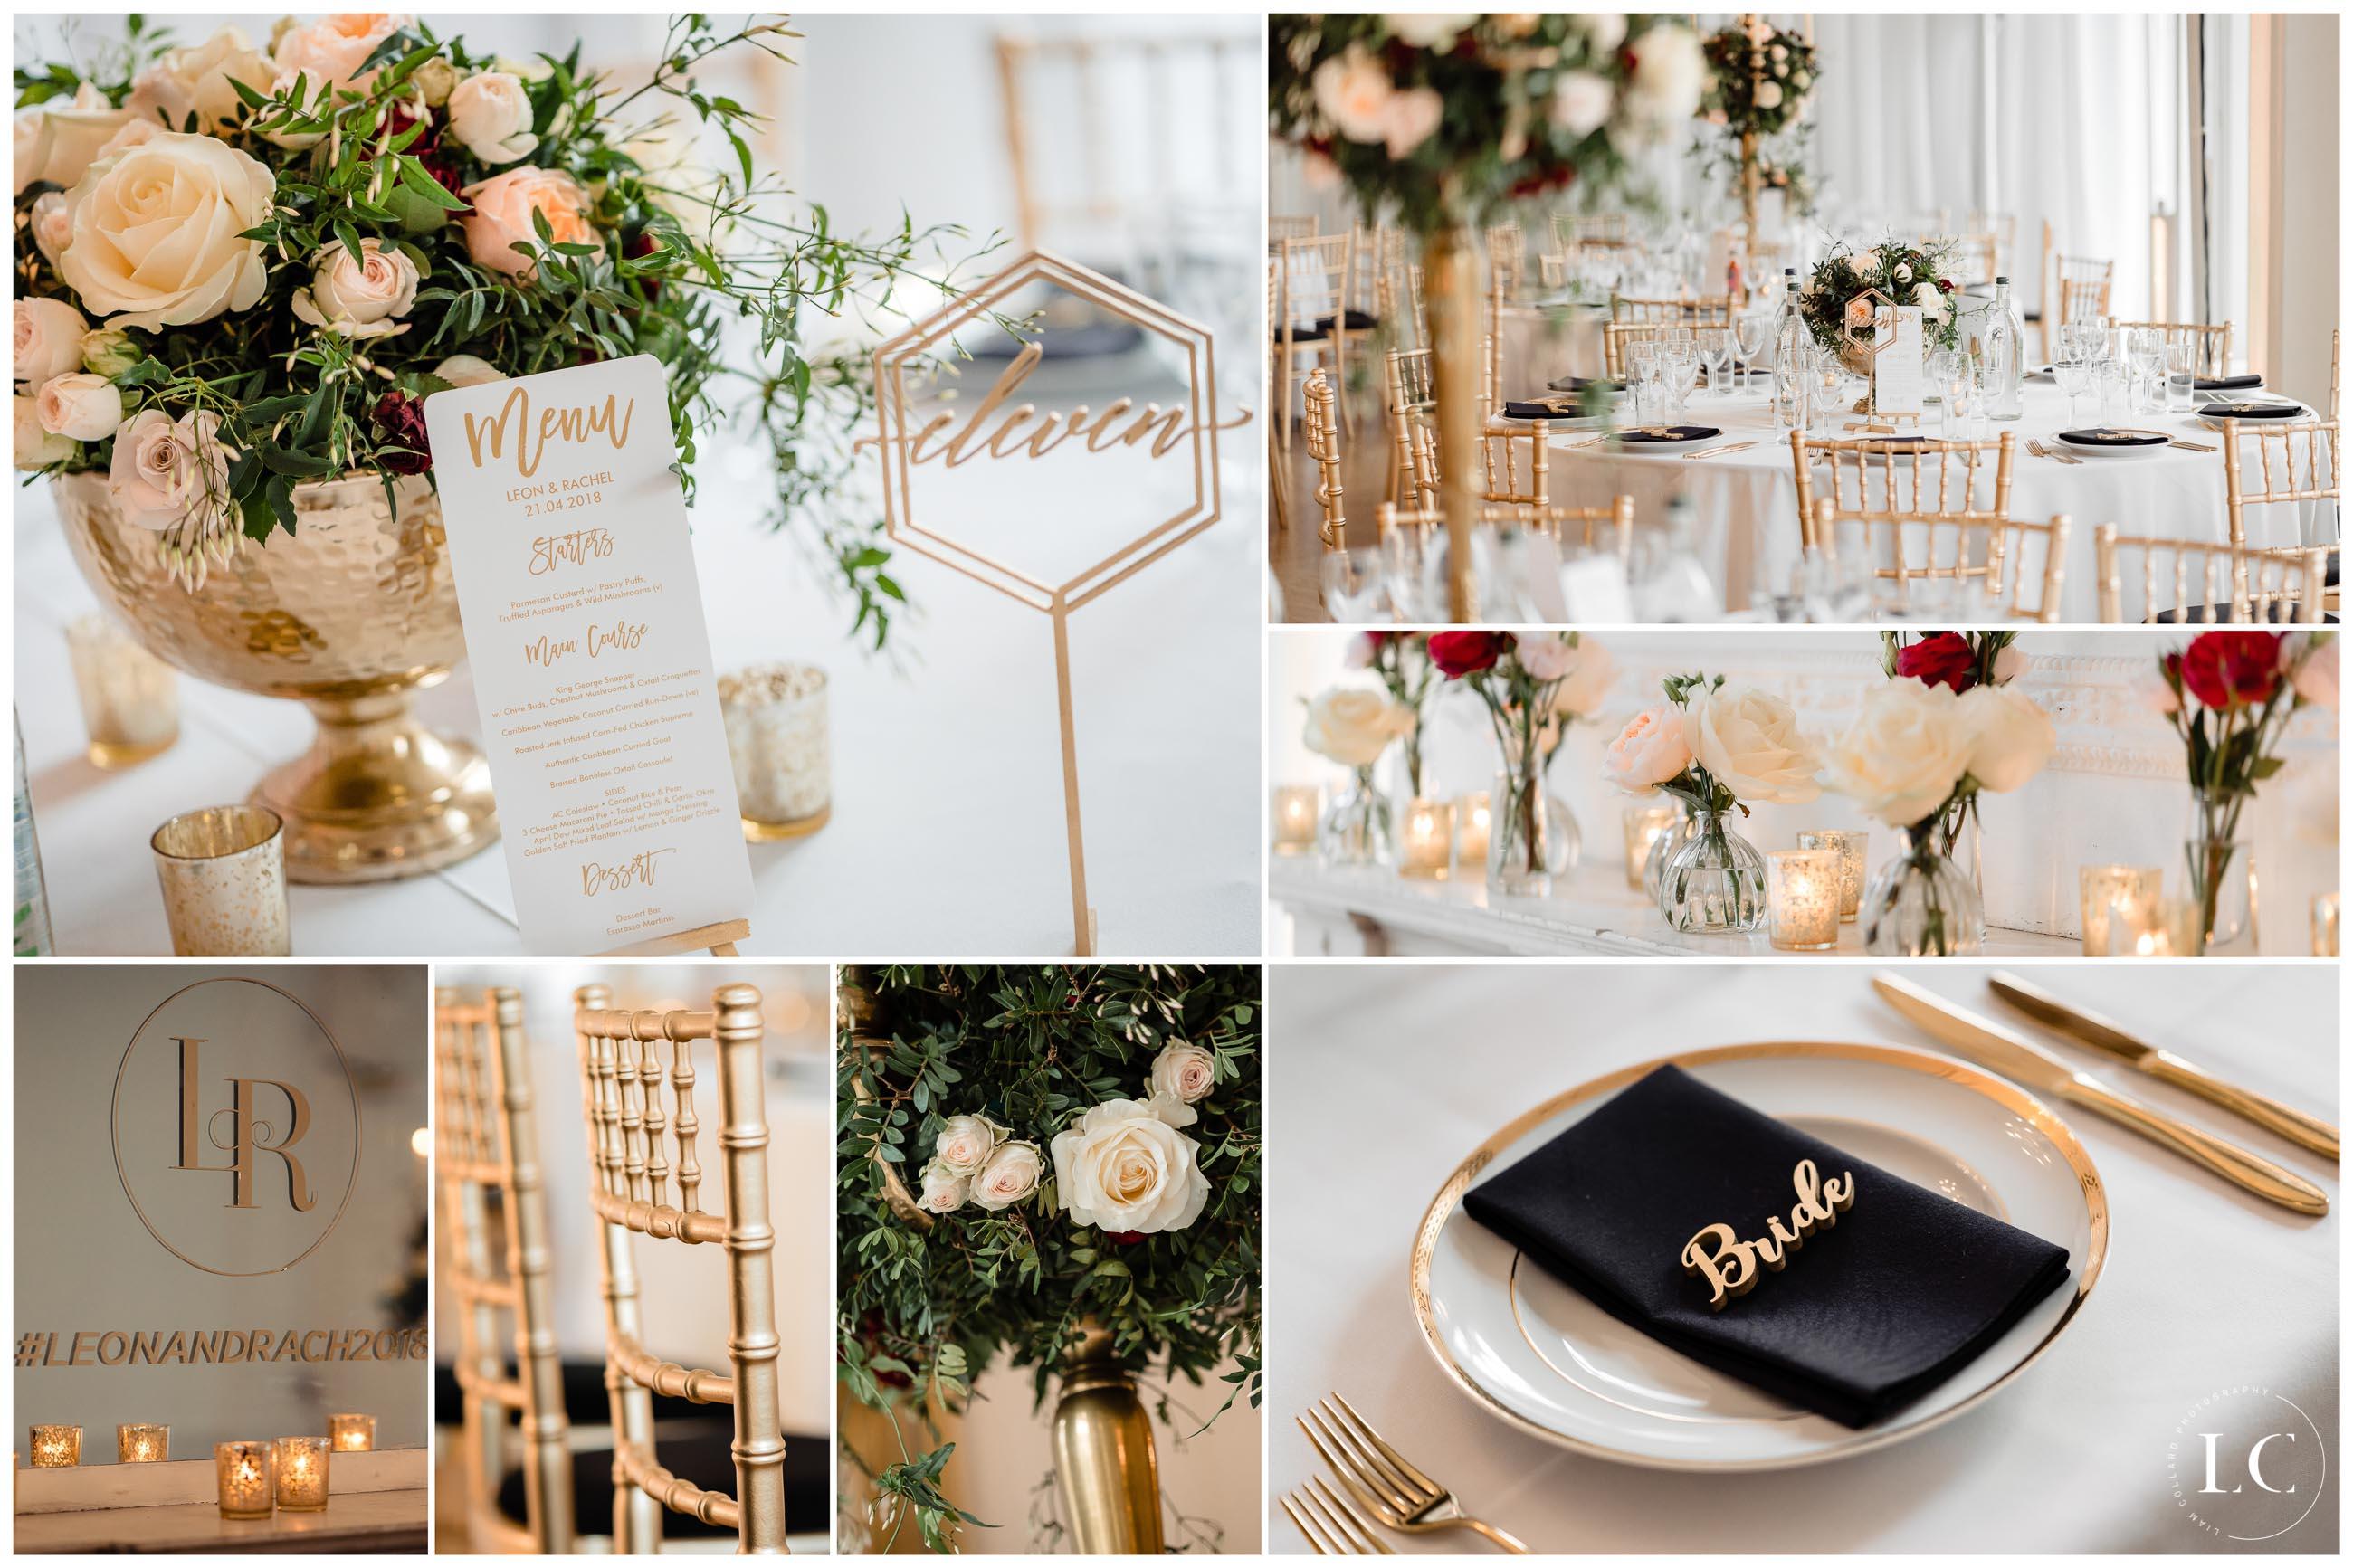 Collage of wedding arrangements